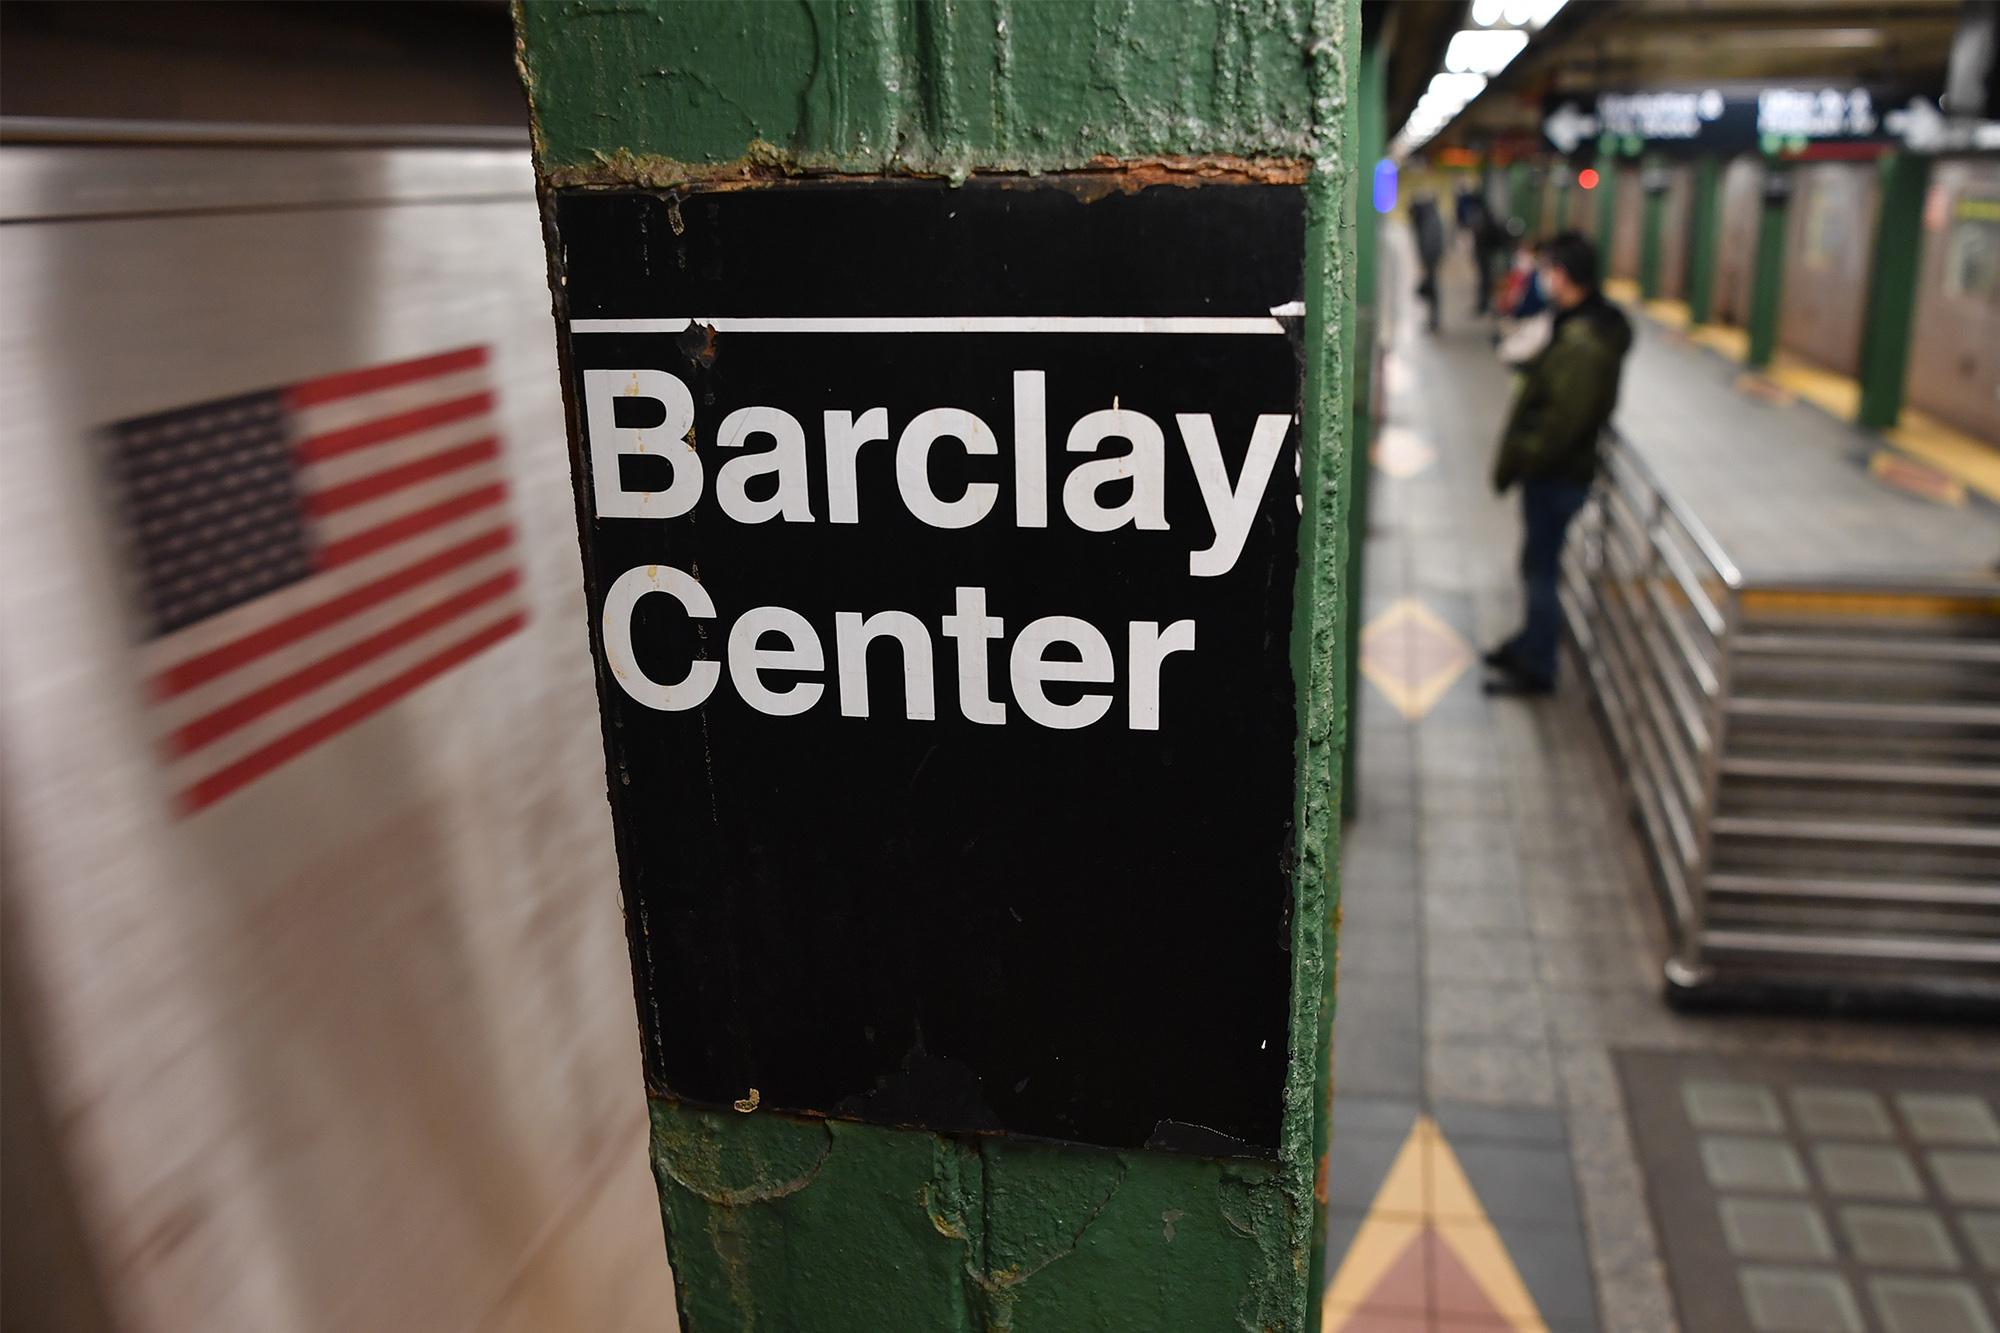 Brooklyn man latest victim of subway shove attacks